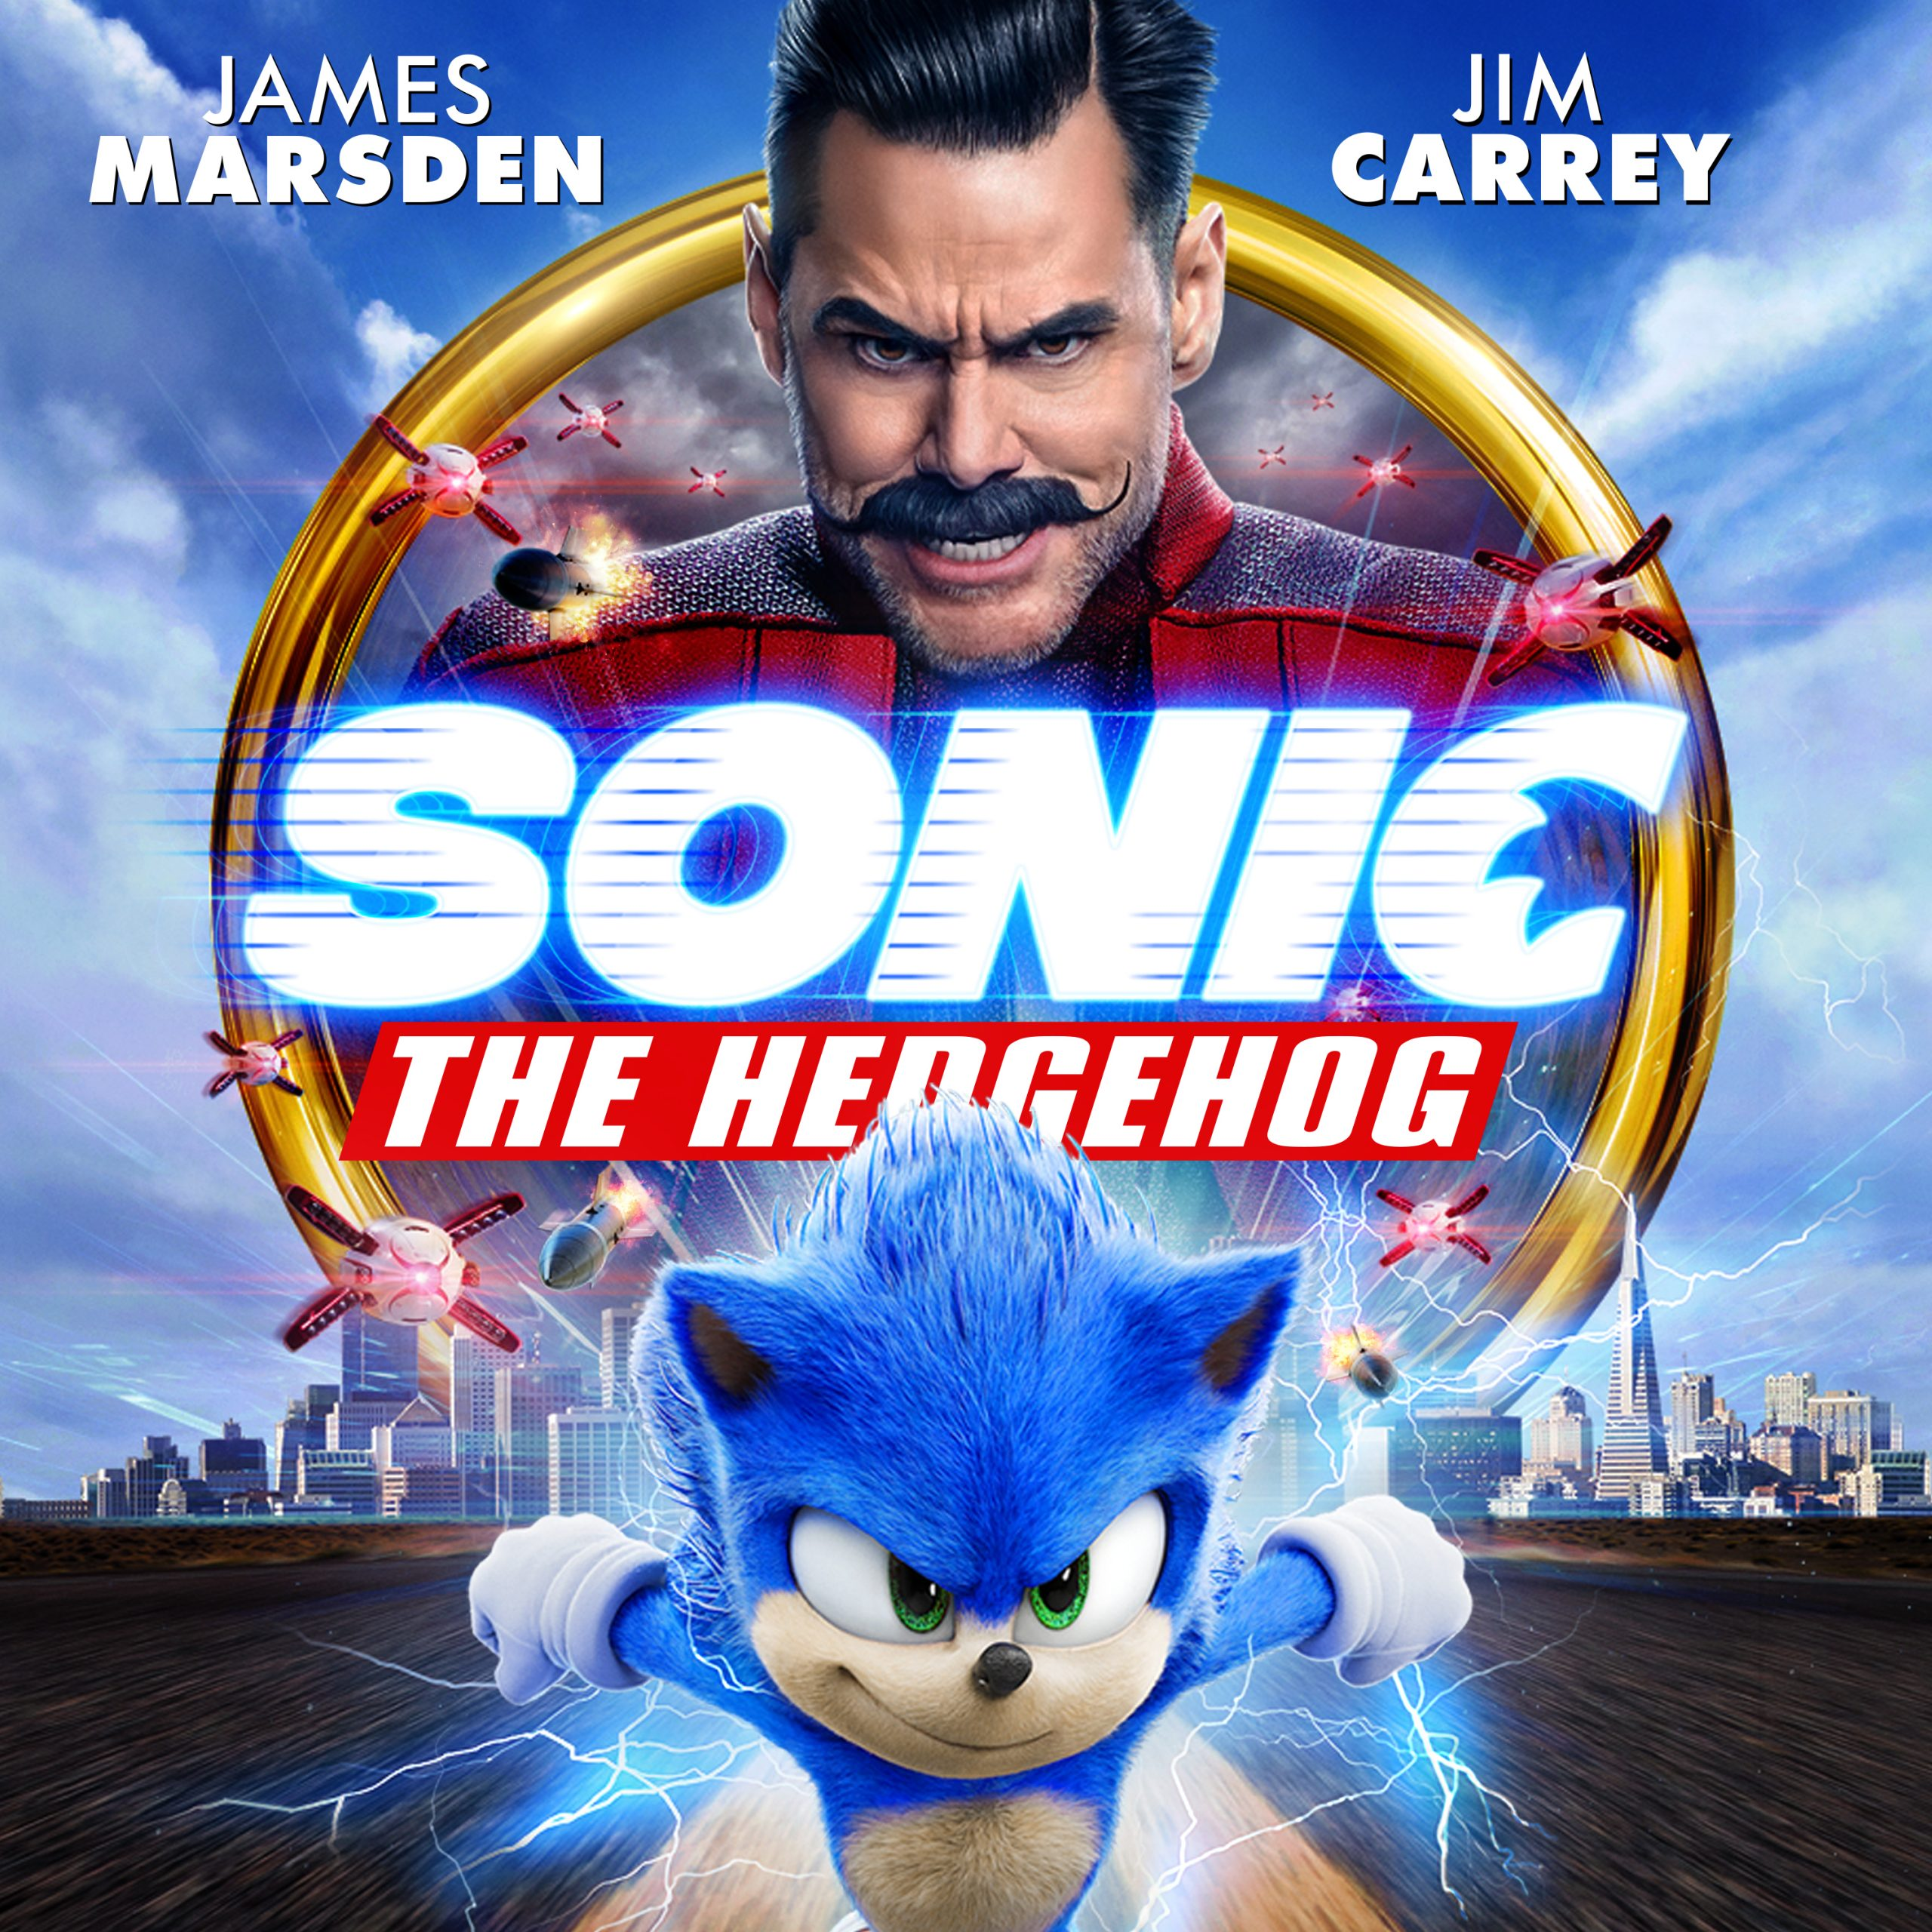 sonic the hedgehog movie 2020 dvd